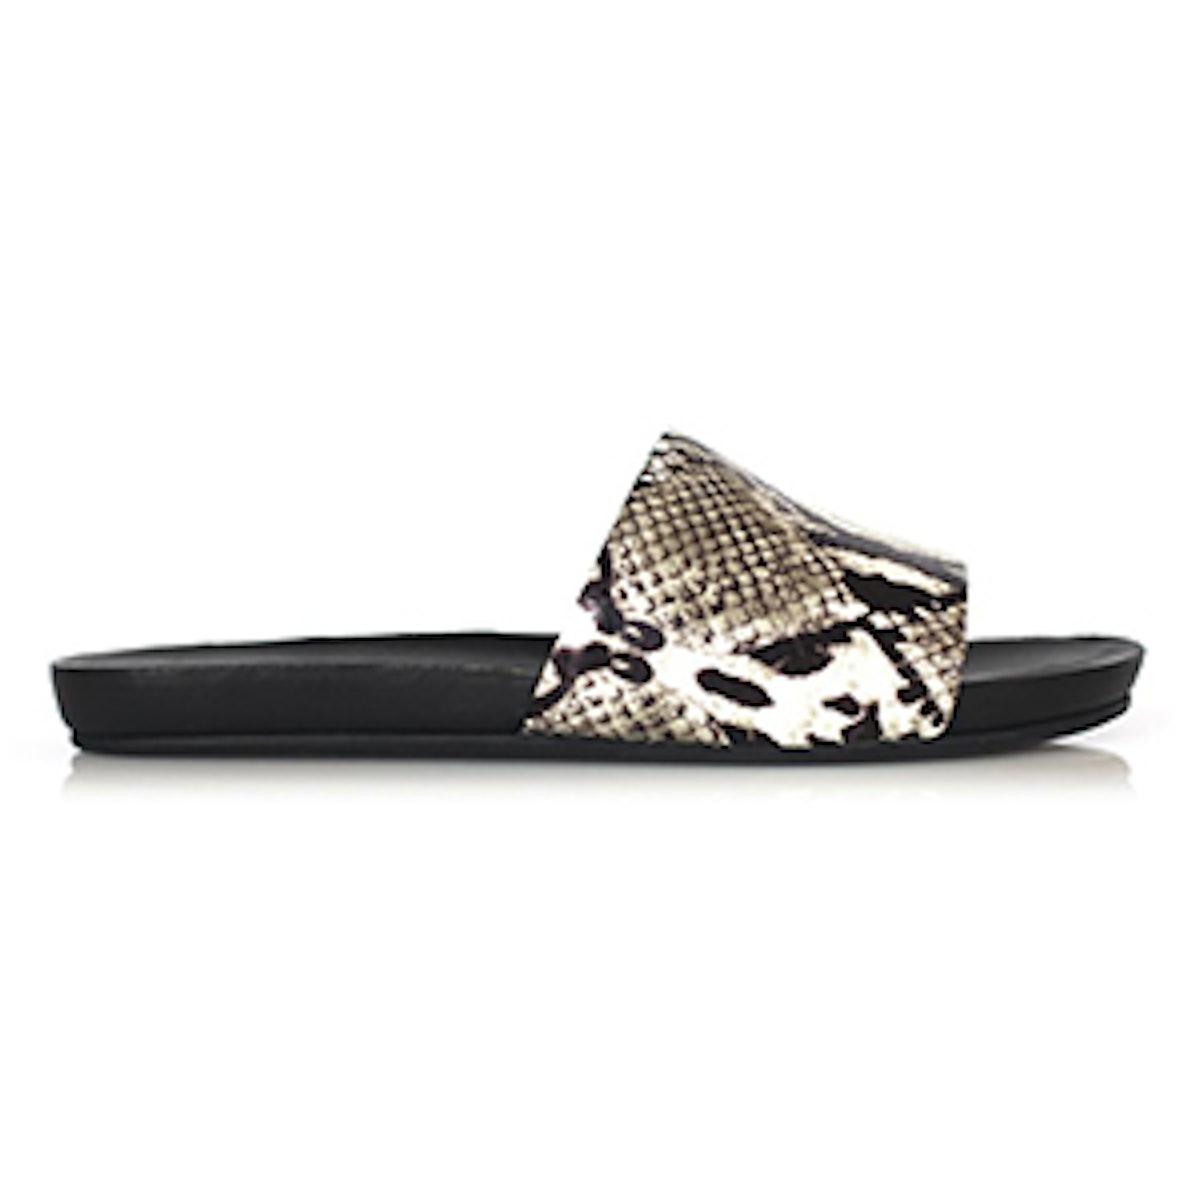 Ellery Leather Slides